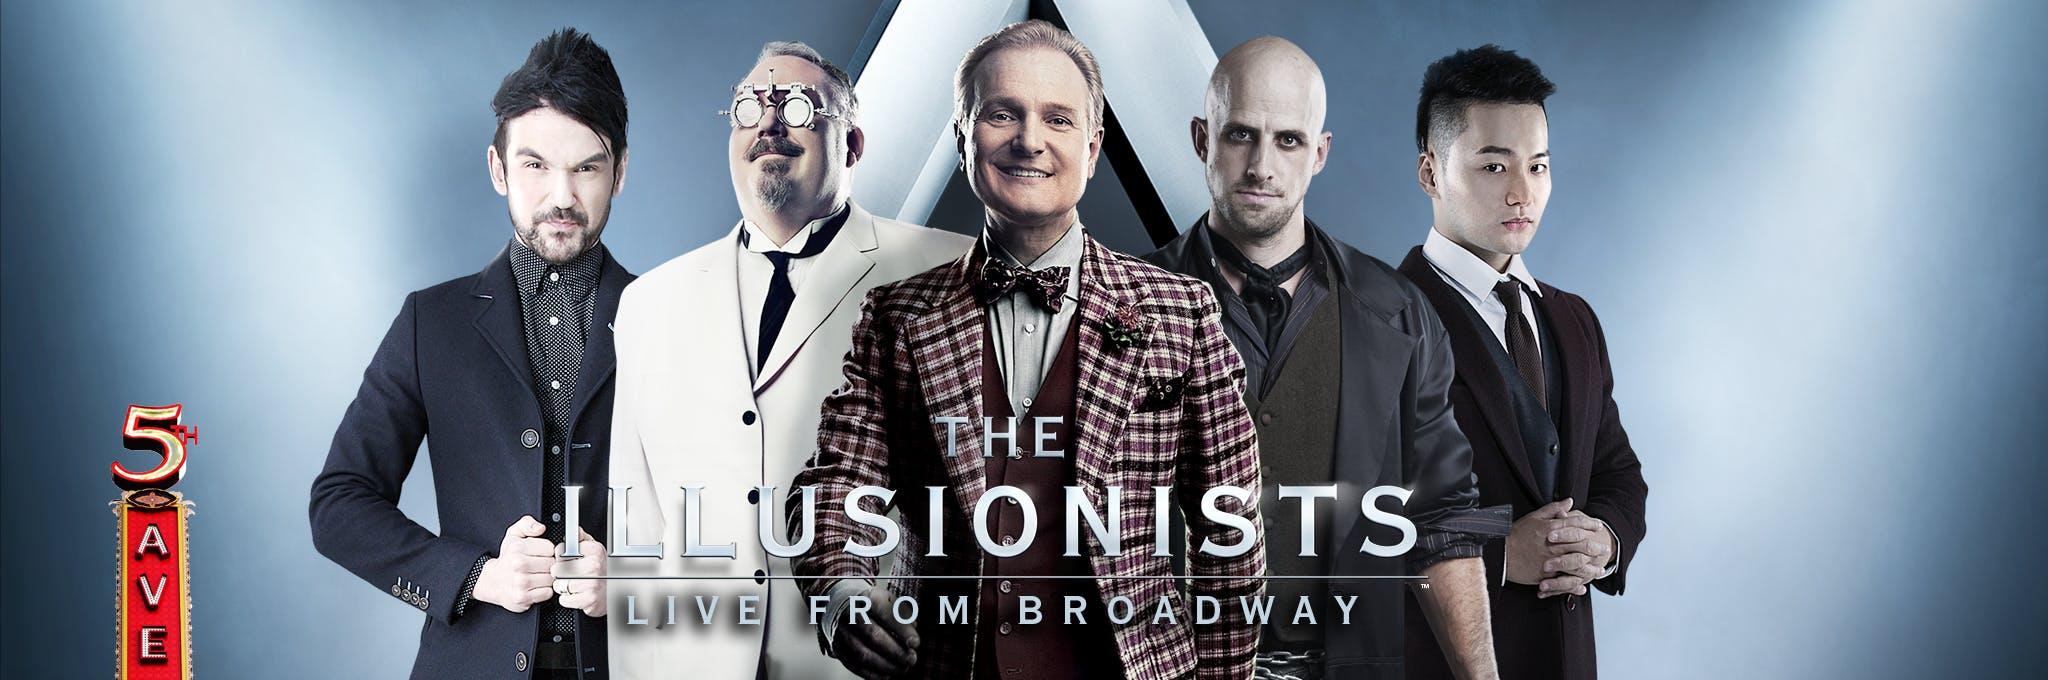 The Illusionists Logo